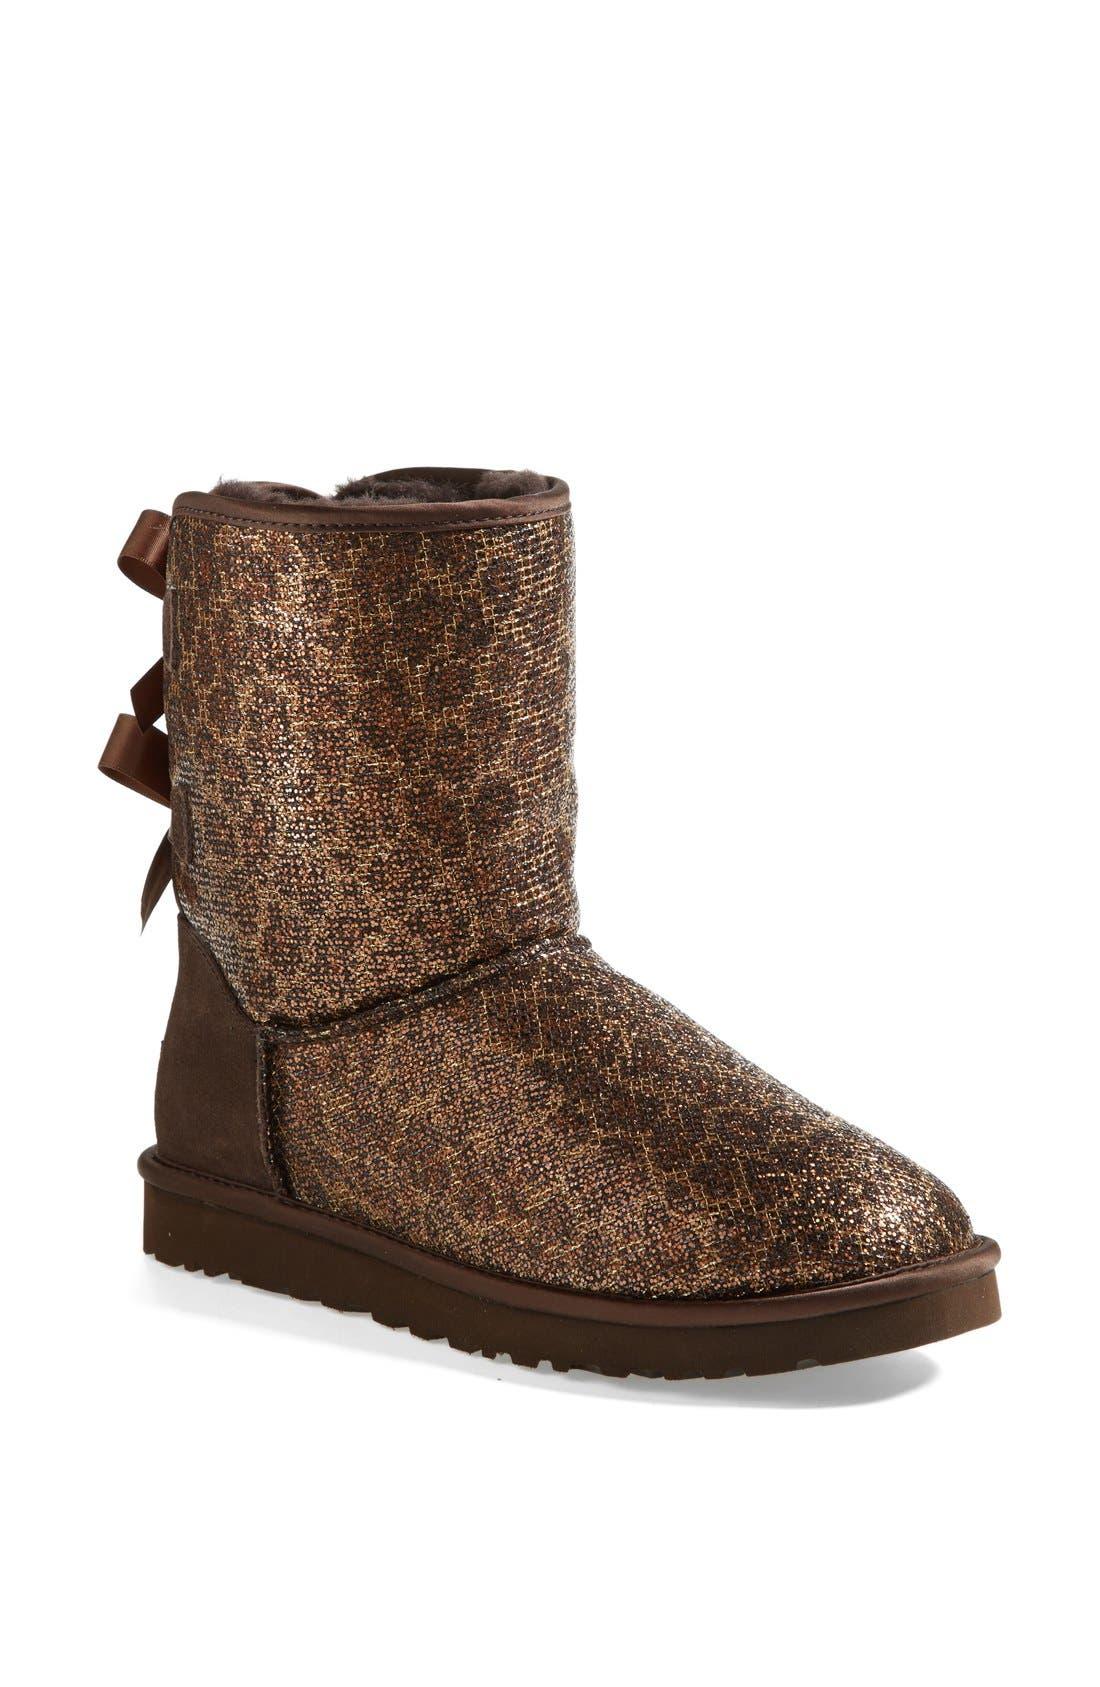 Main Image - UGG® Australia 'Bailey Bow Glitter' Boot (Women)